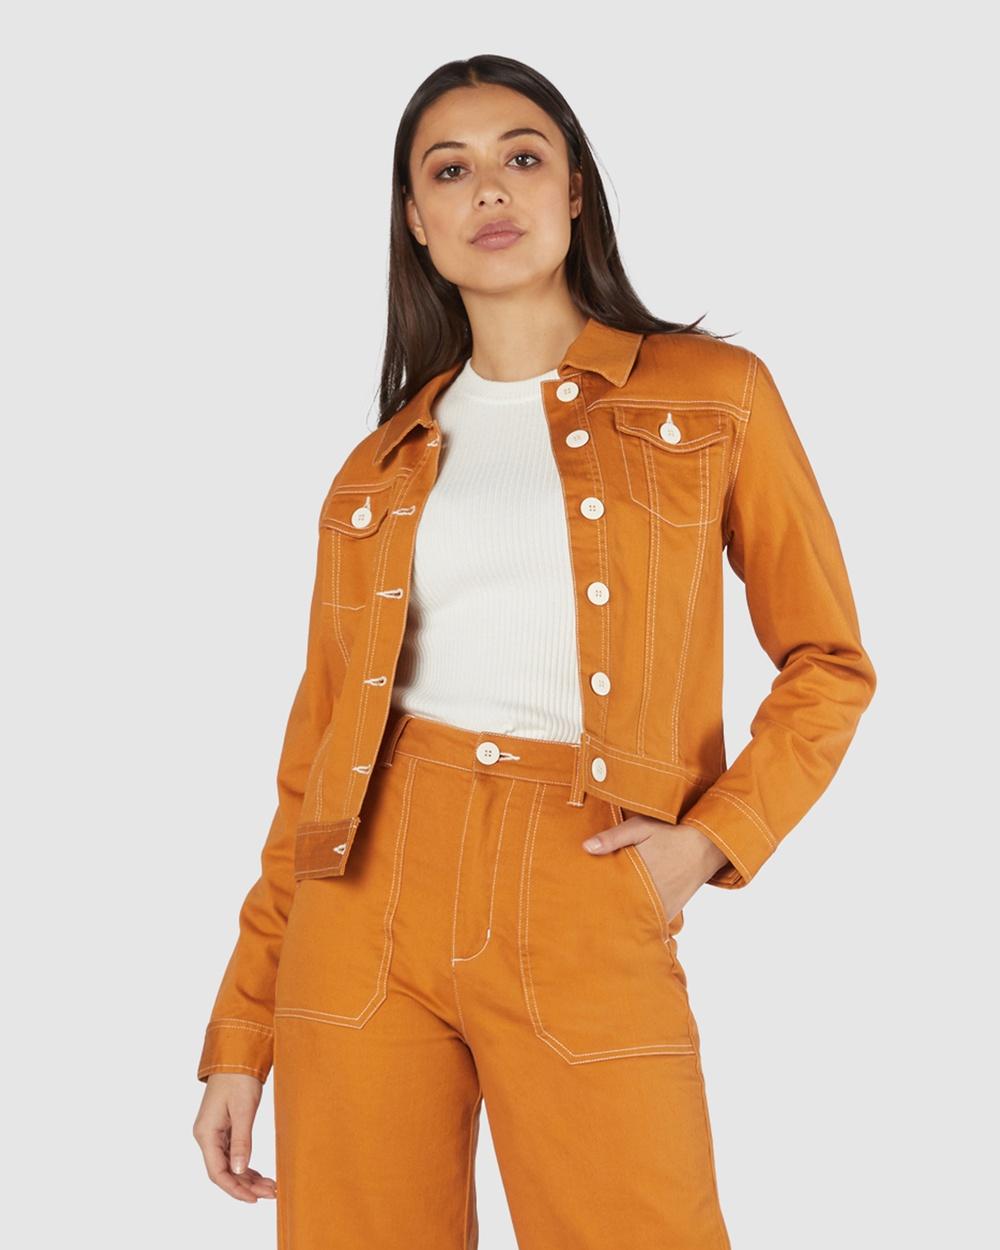 Princess Highway Angie Drill Jacket Denim jacket Gold Australia